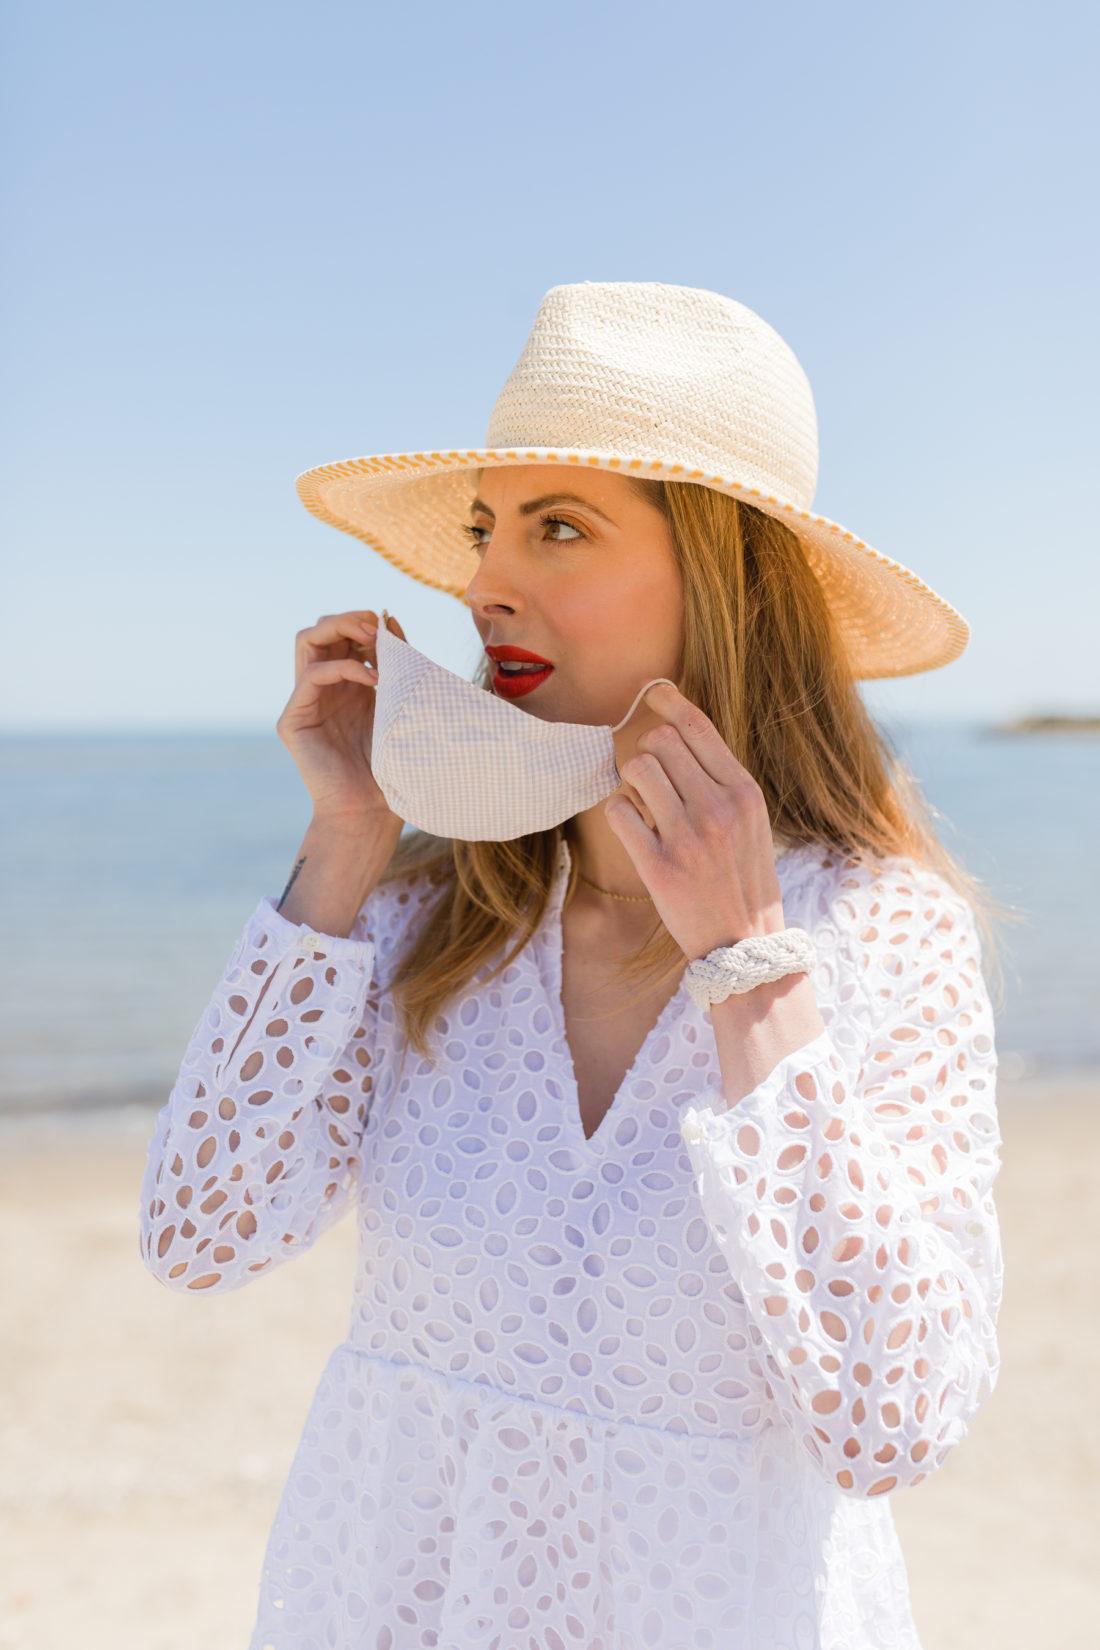 Eva Amurri shares her summer plans